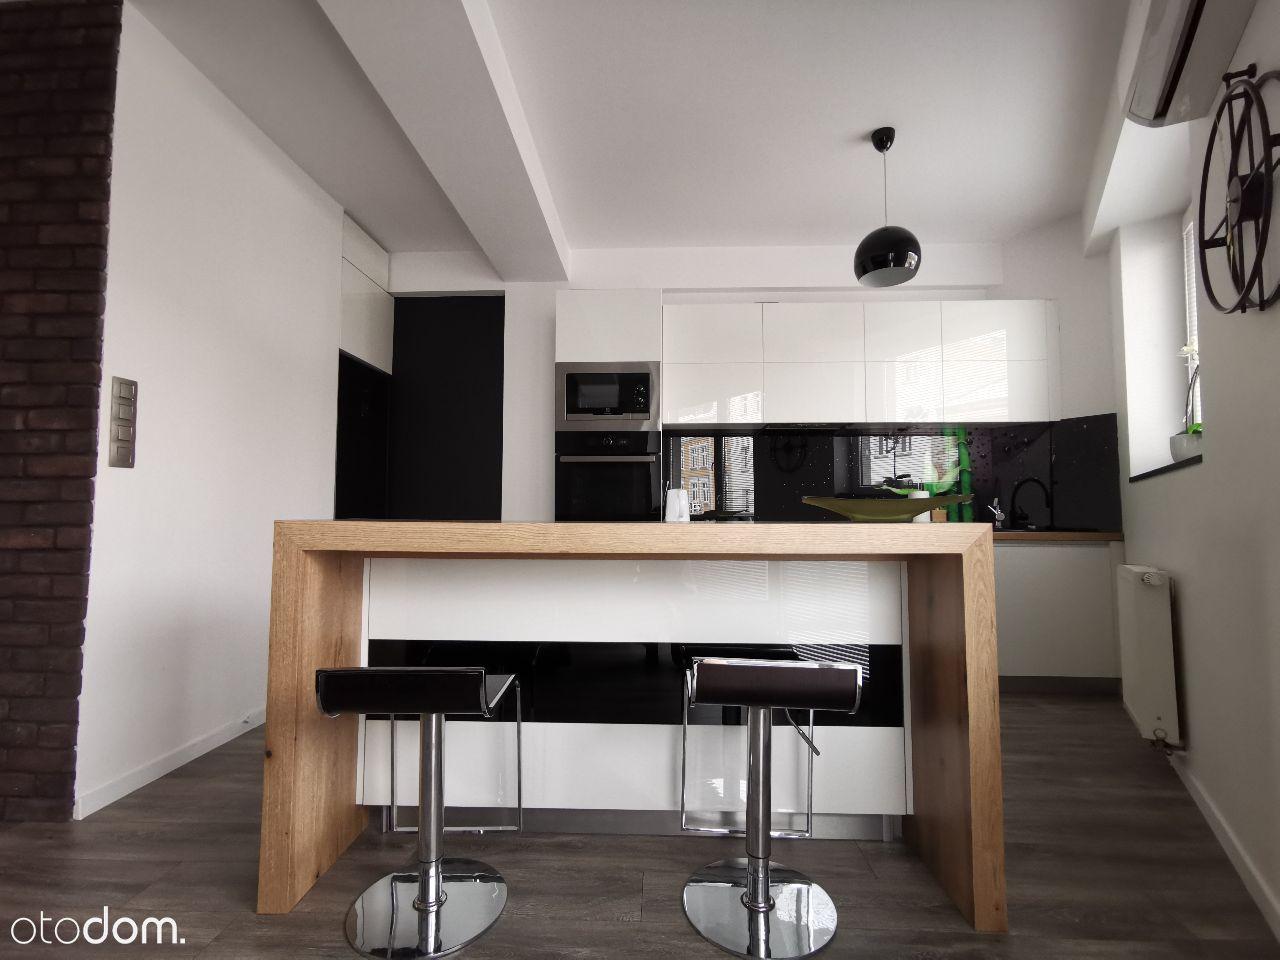 Apartament z 2014 roku w centrum miasta+ garaż